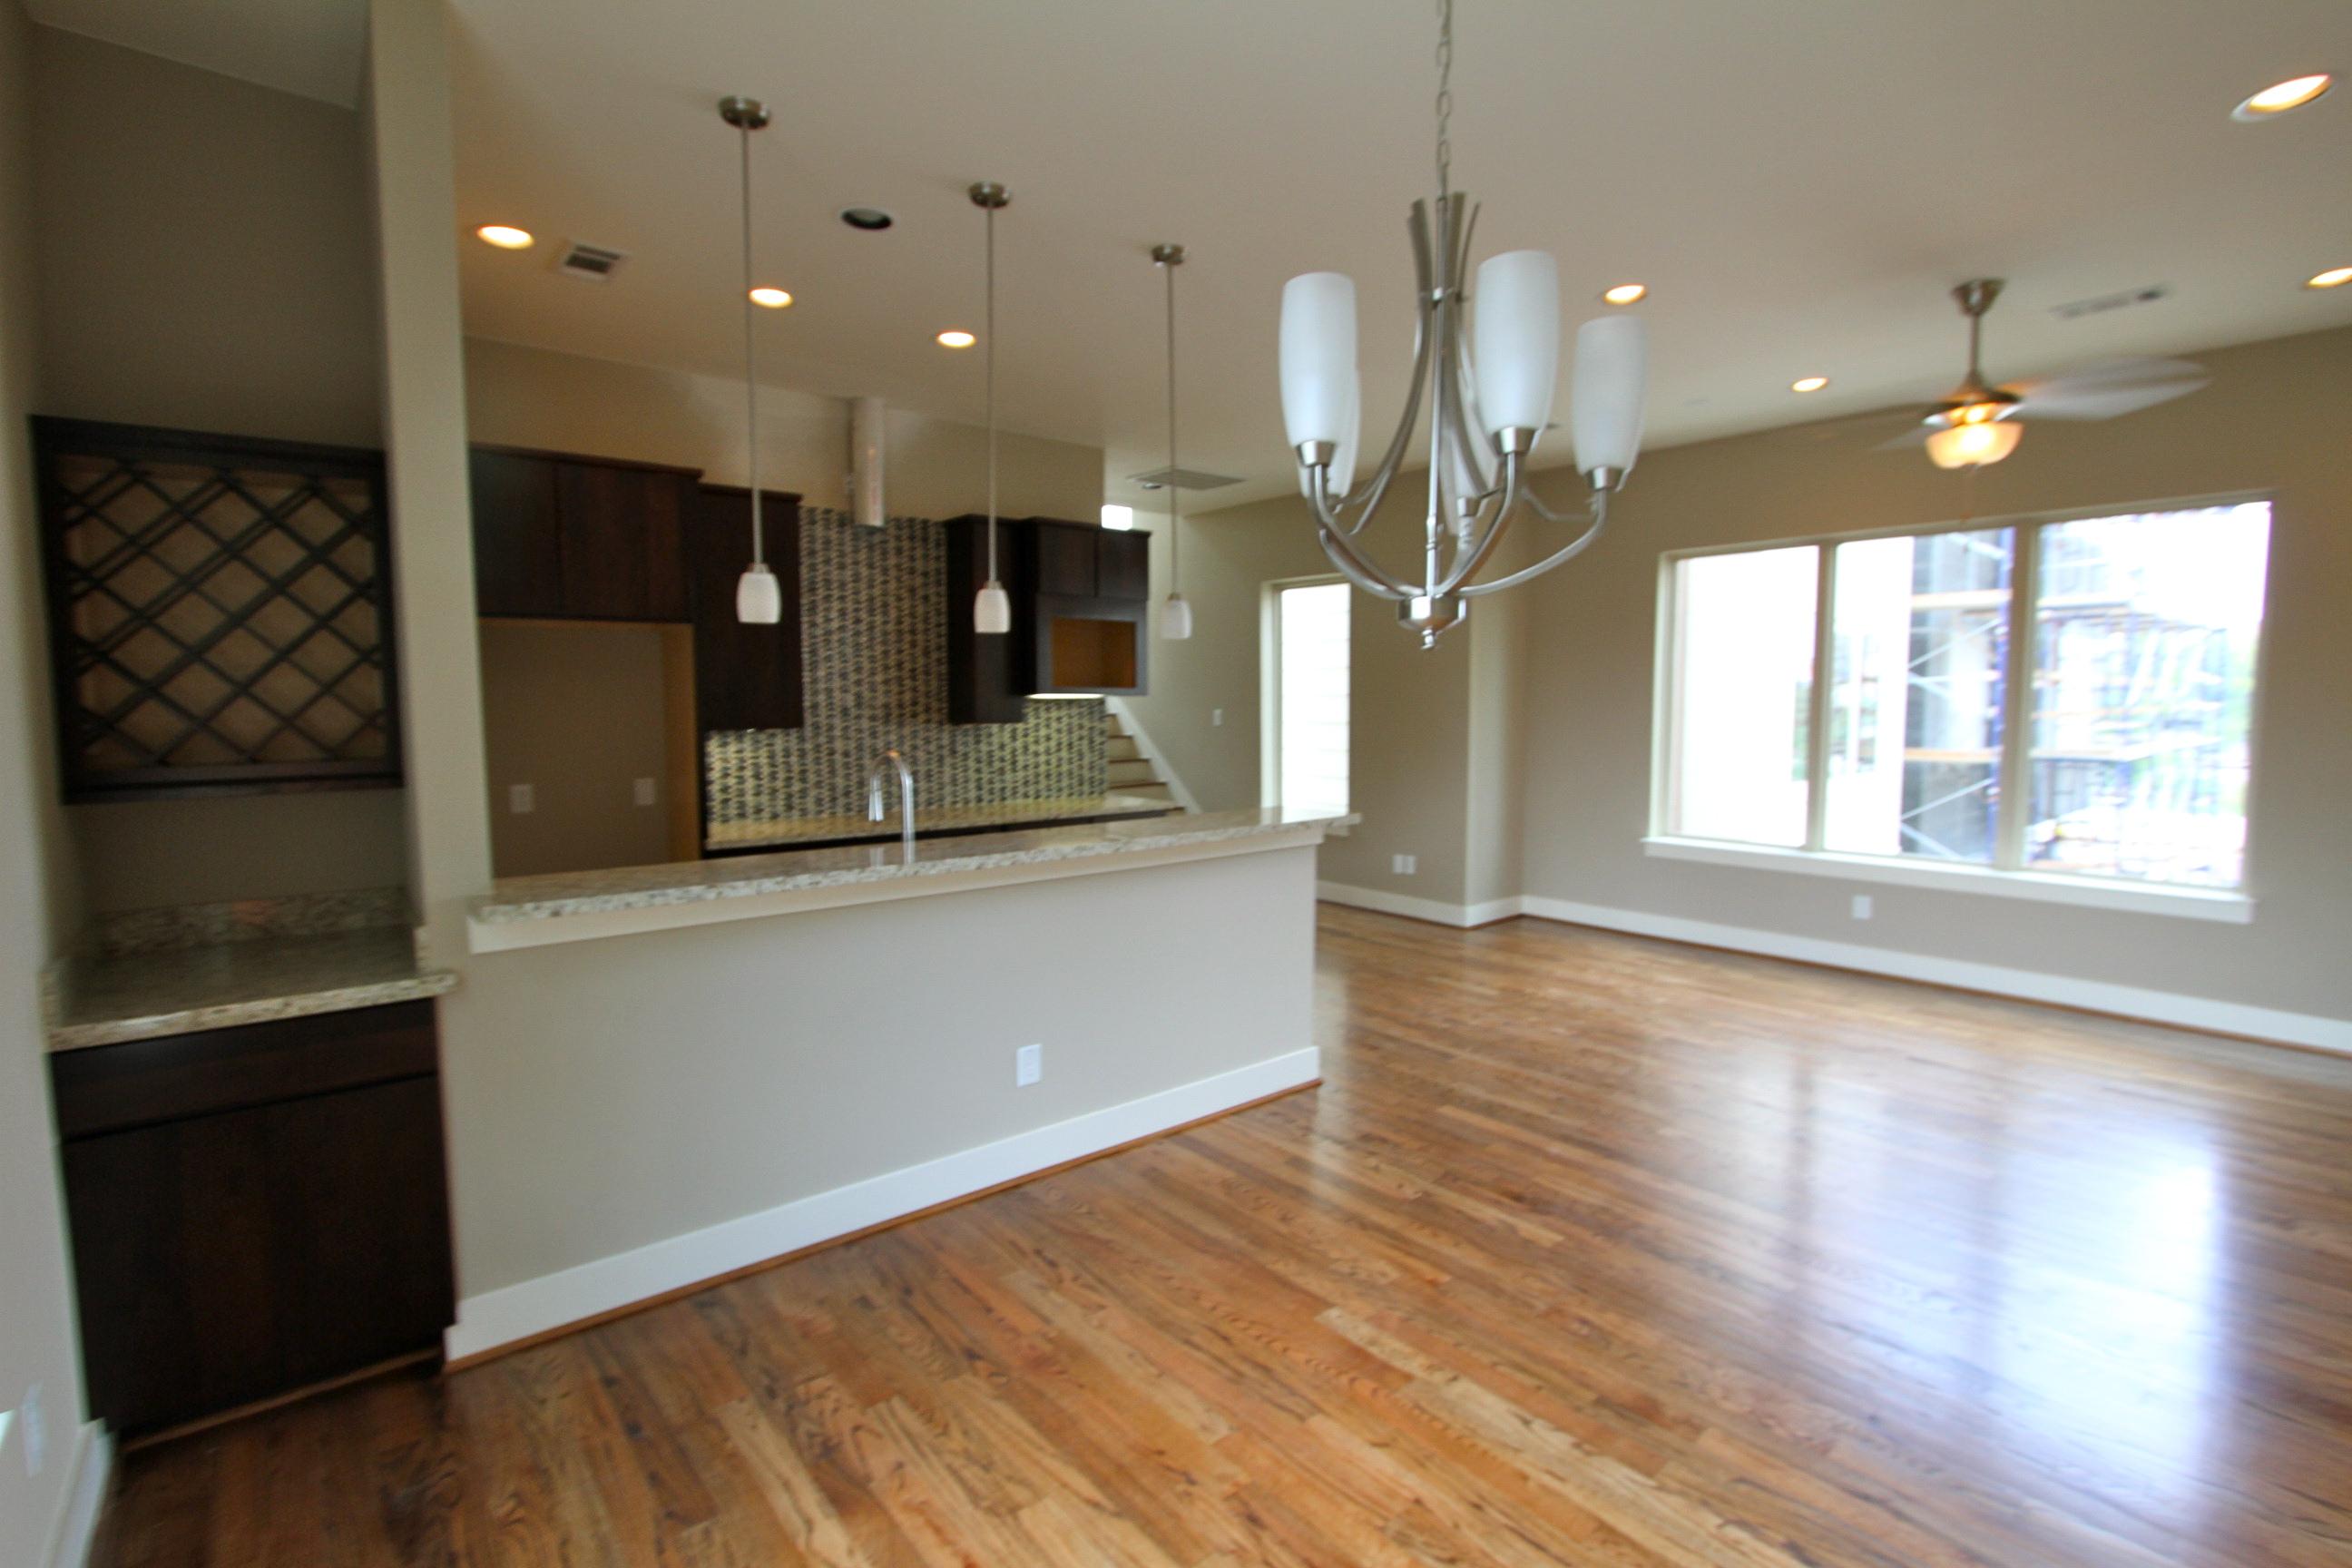 Kitchen - Wood Floor - Drake Homes Inc